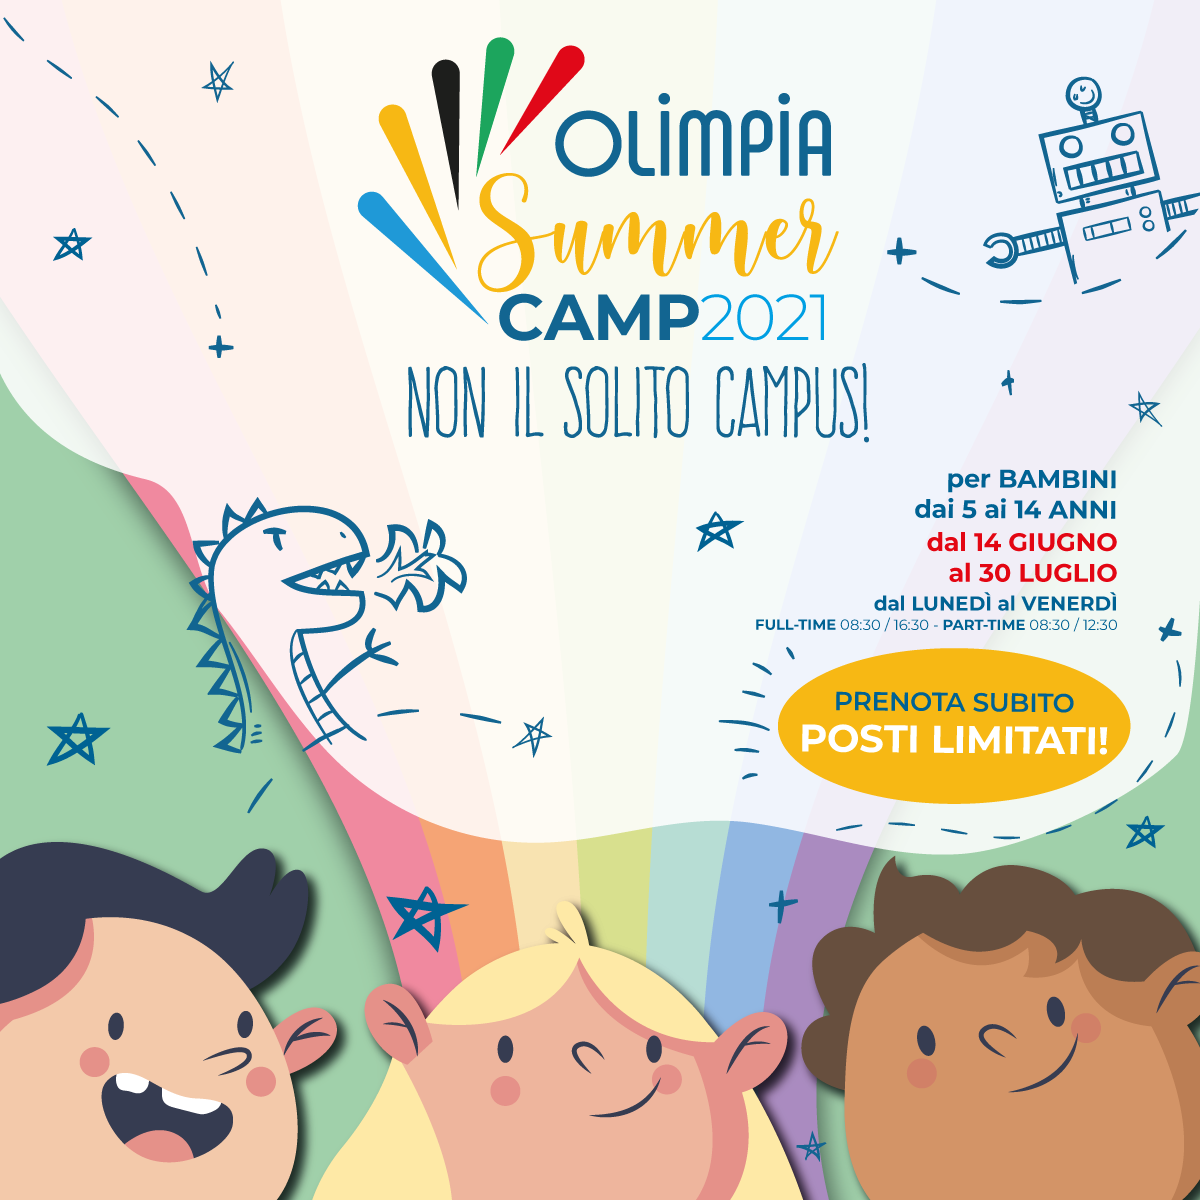 https://www.olimpiasport.it/wp-content/uploads/2021/06/SUMMERCAMP2021_news.png